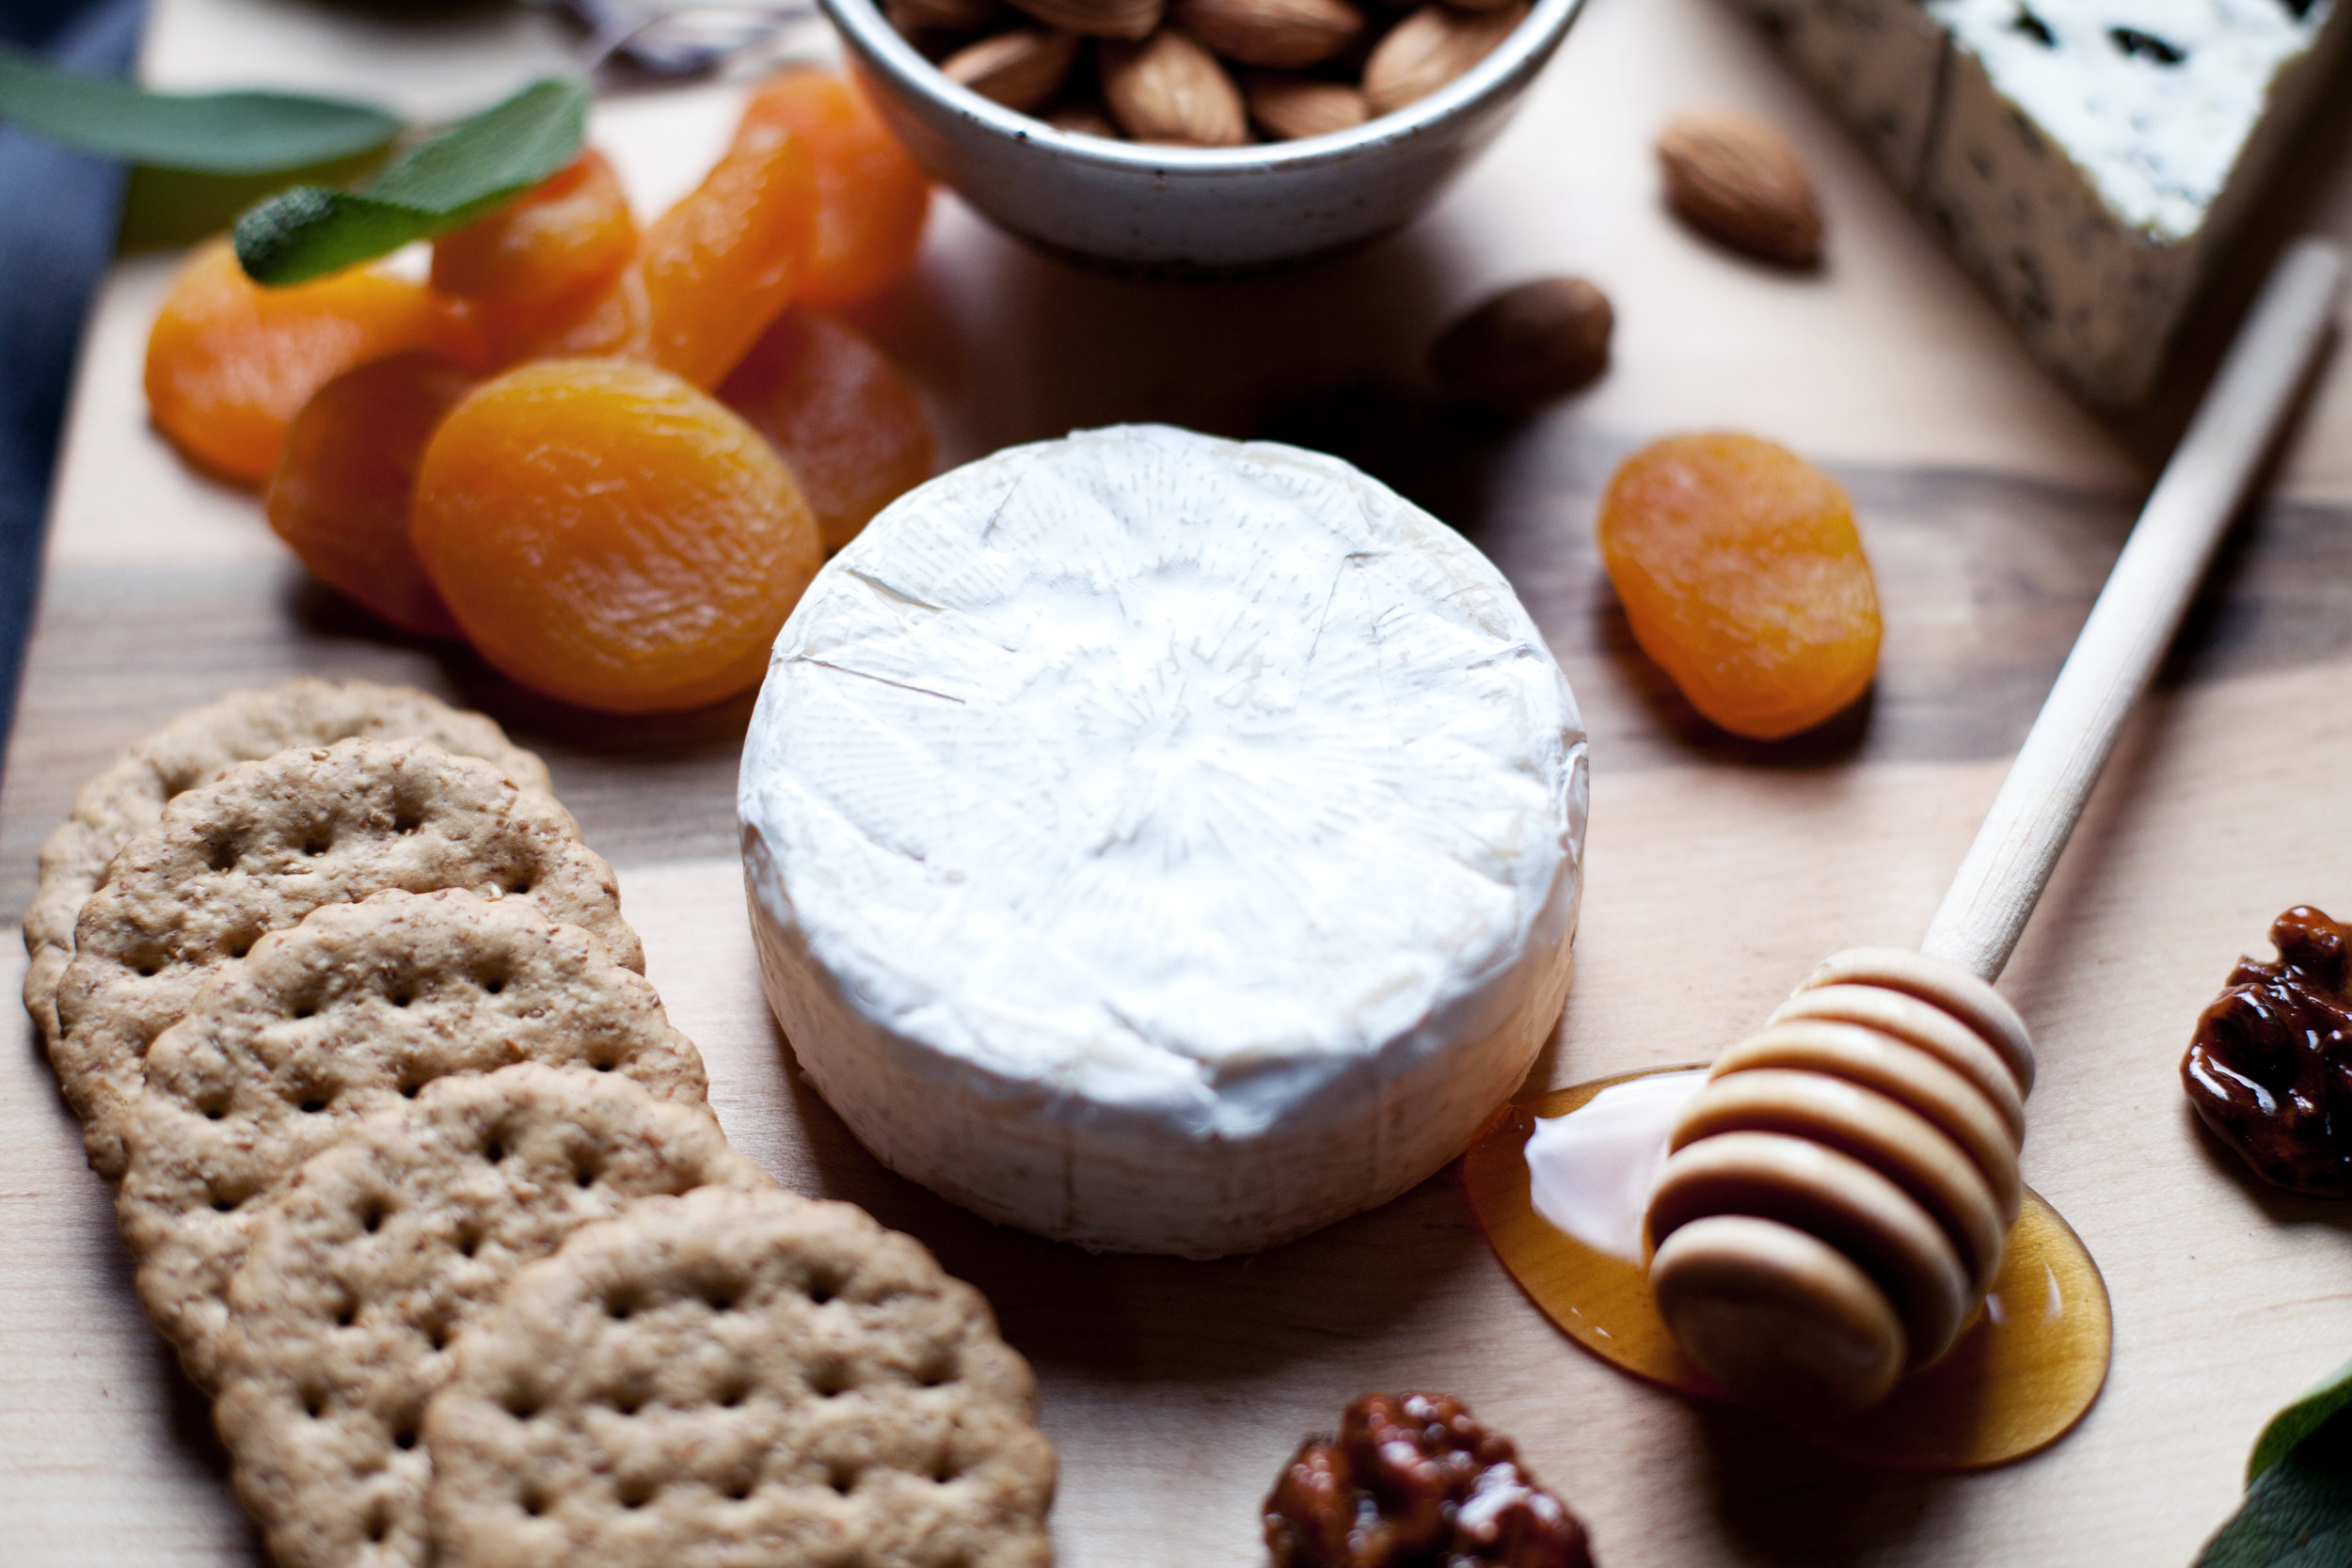 castello sweet cheese board vi.jpg